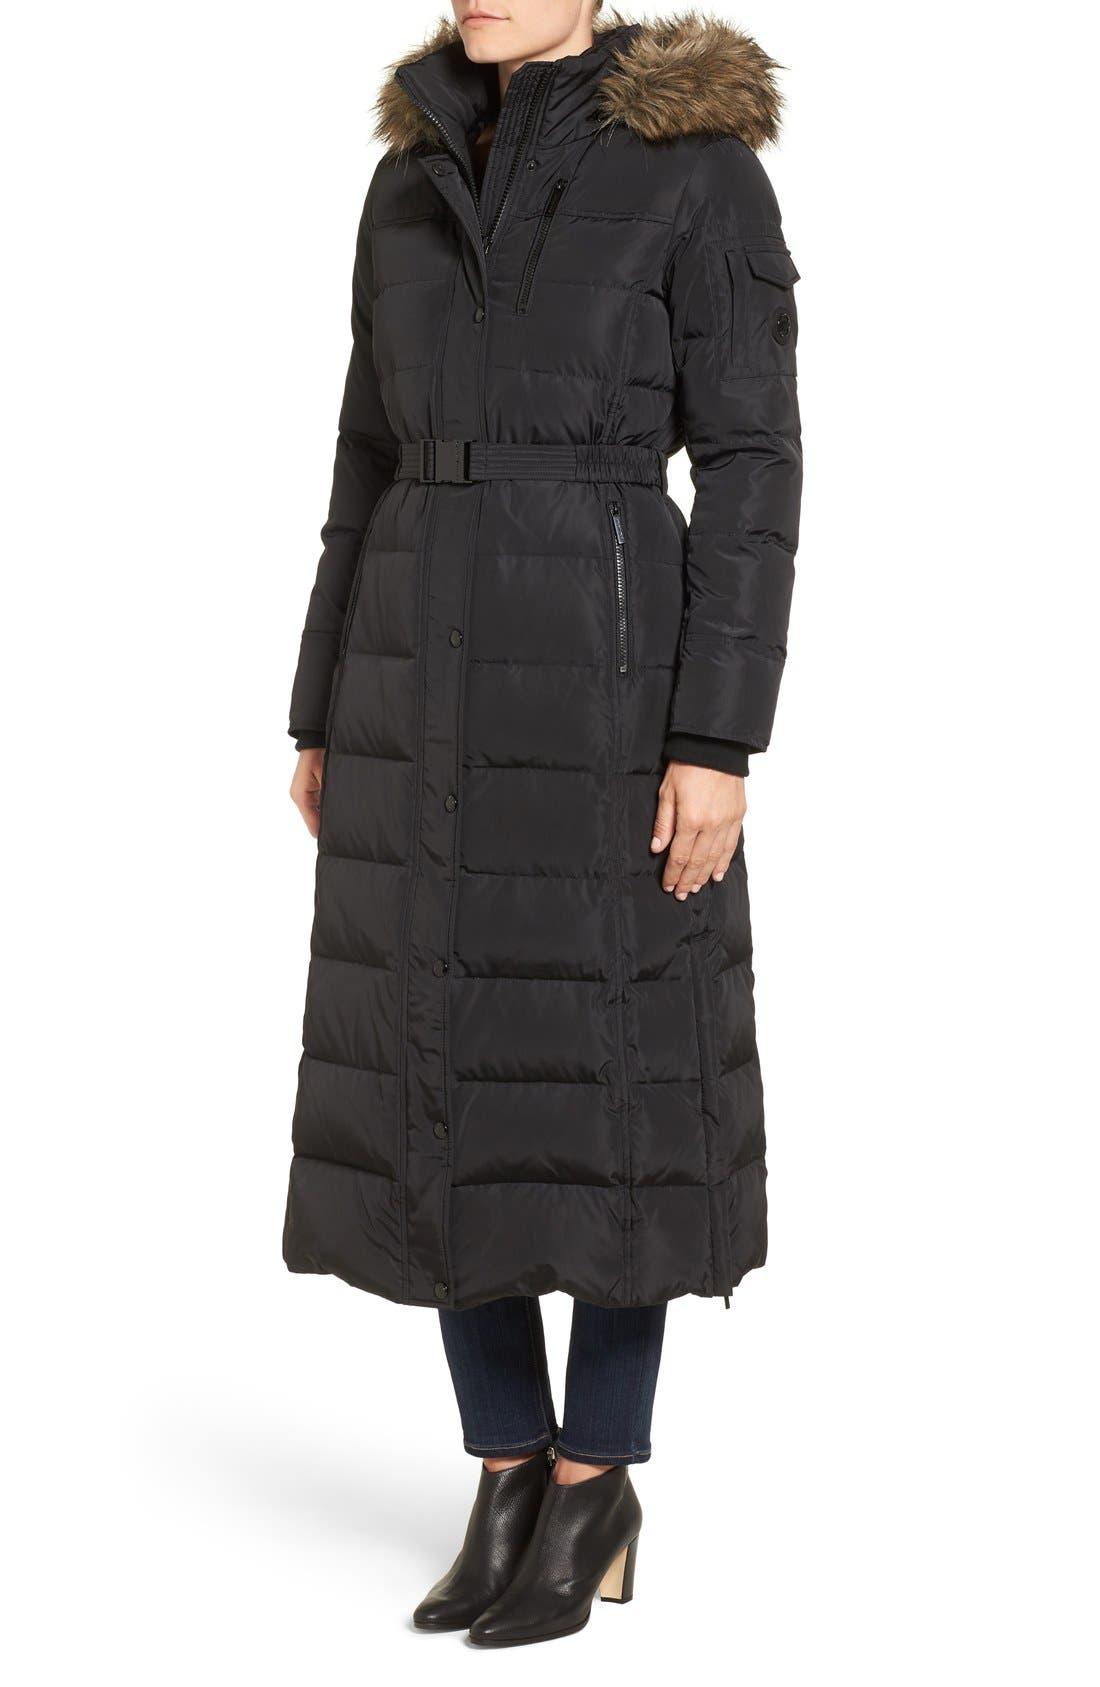 KORS MICHAEL KORS, Faux Fur Trim Belted Down & Feather Fill Maxi Coat, Alternate thumbnail 3, color, 001